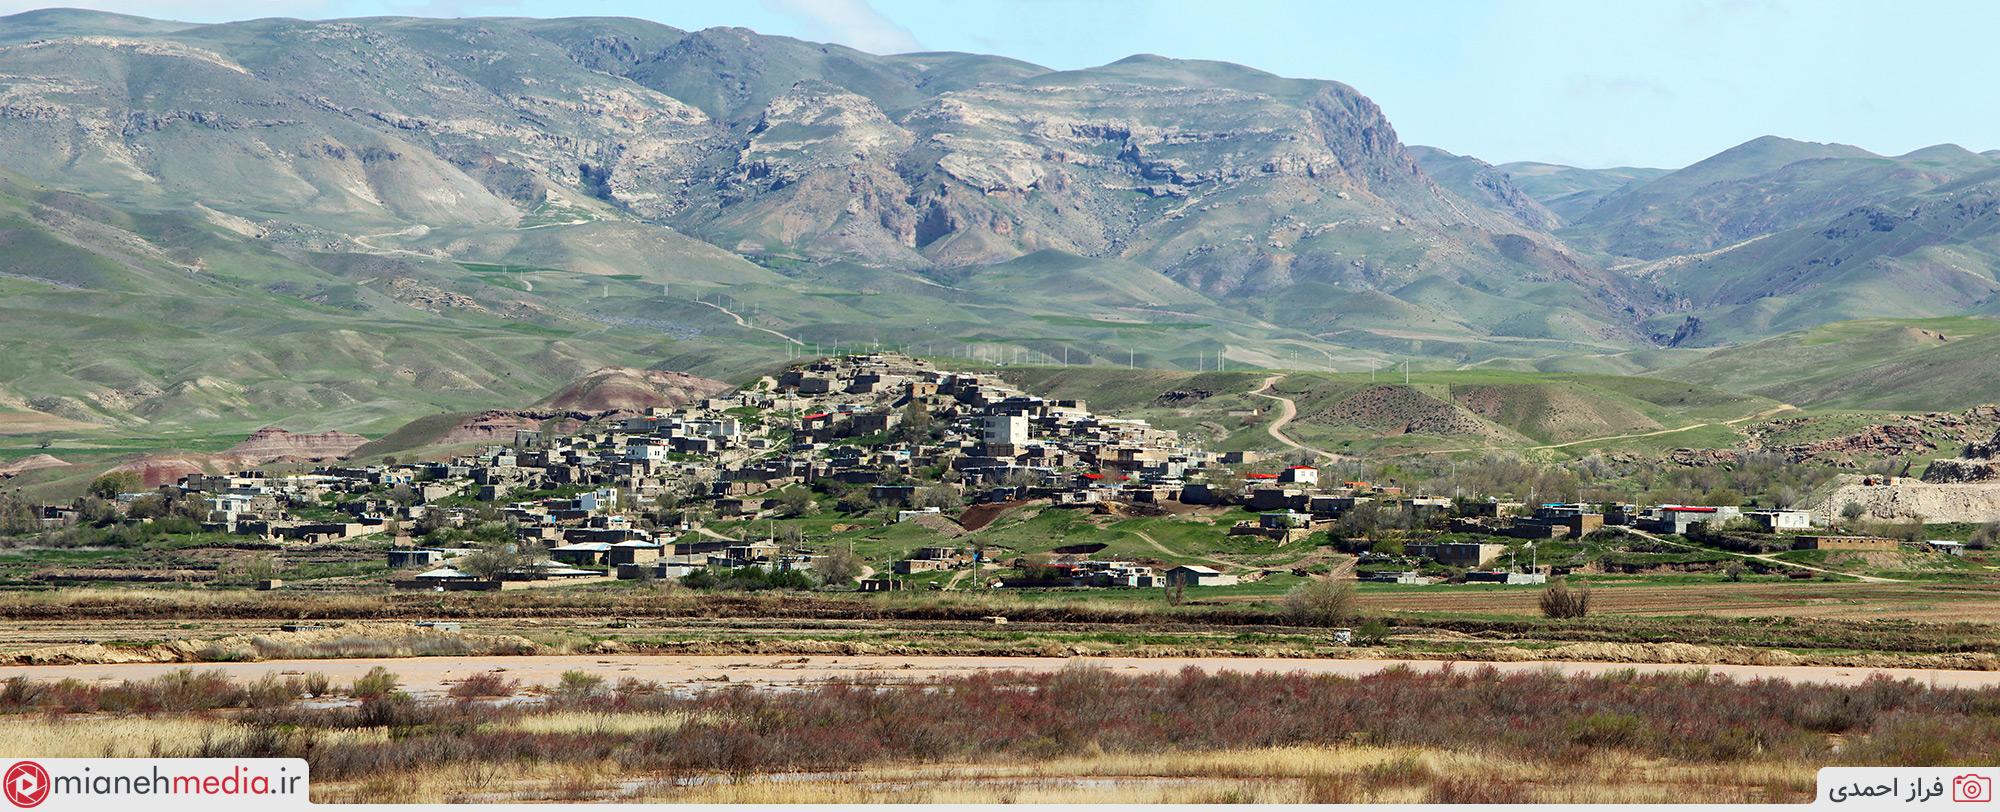 روستای ممان (مامان)